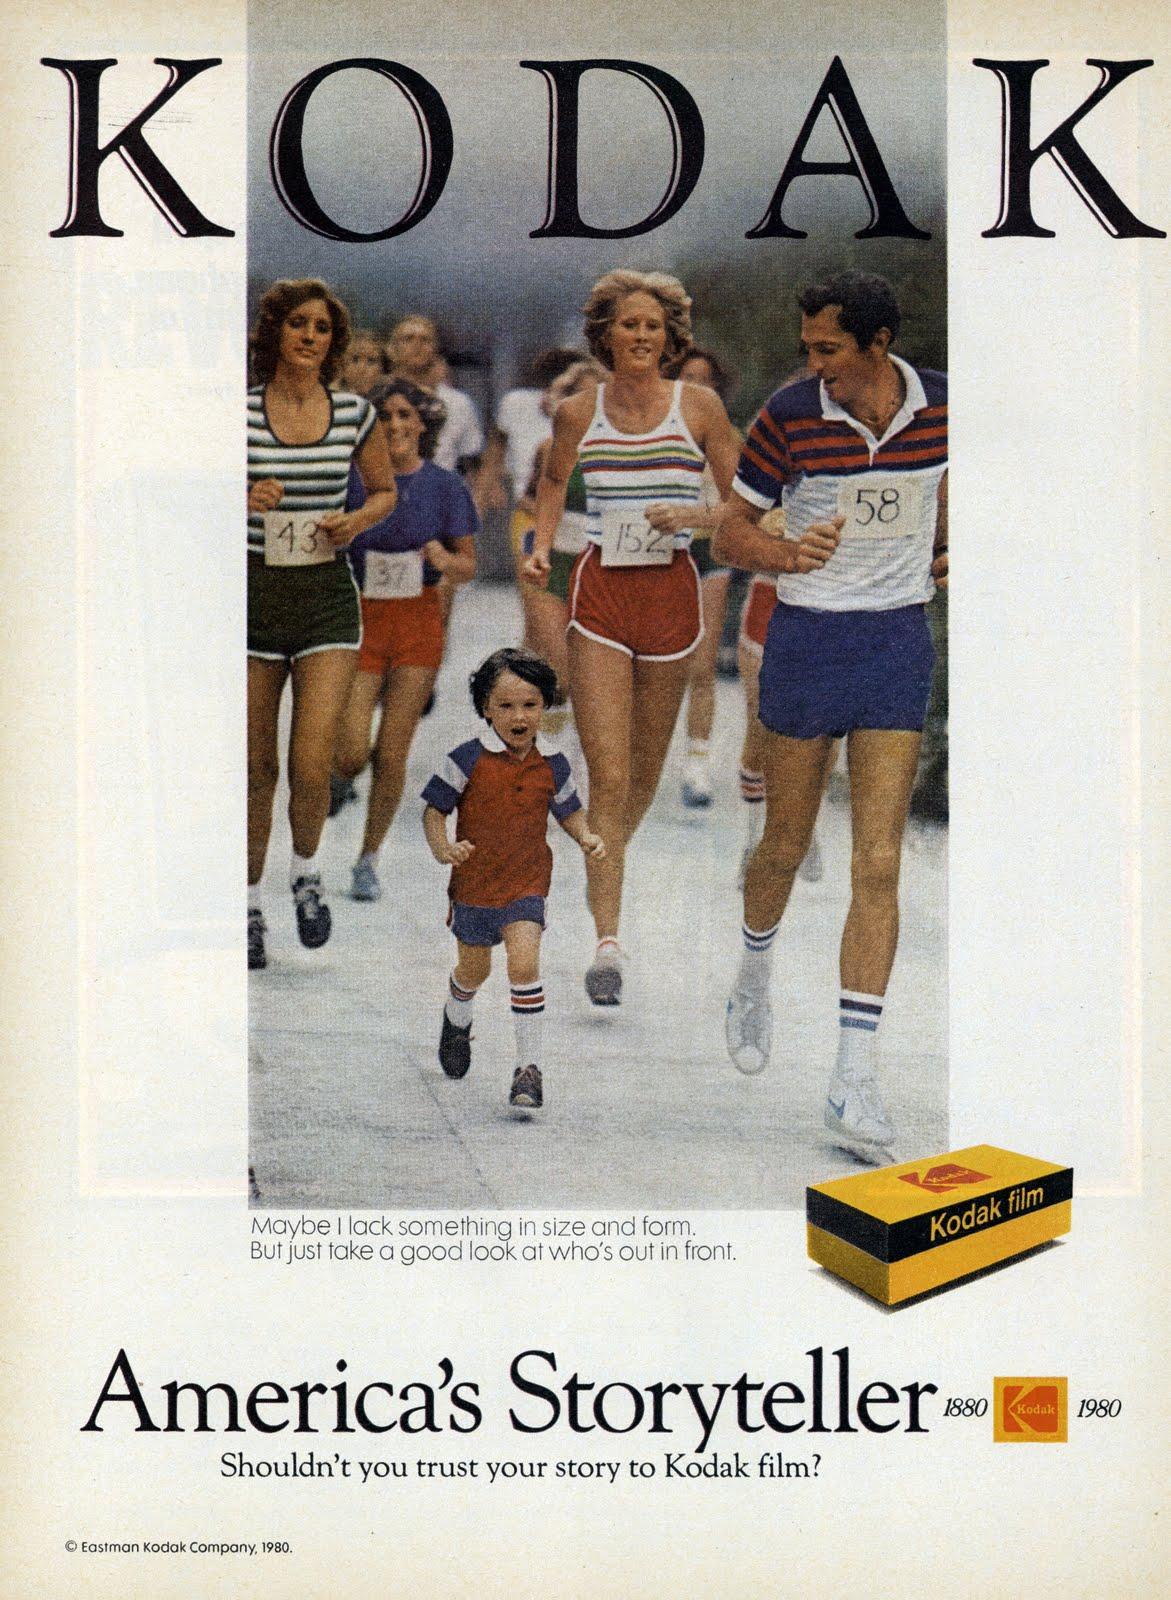 Run, little guy, run.